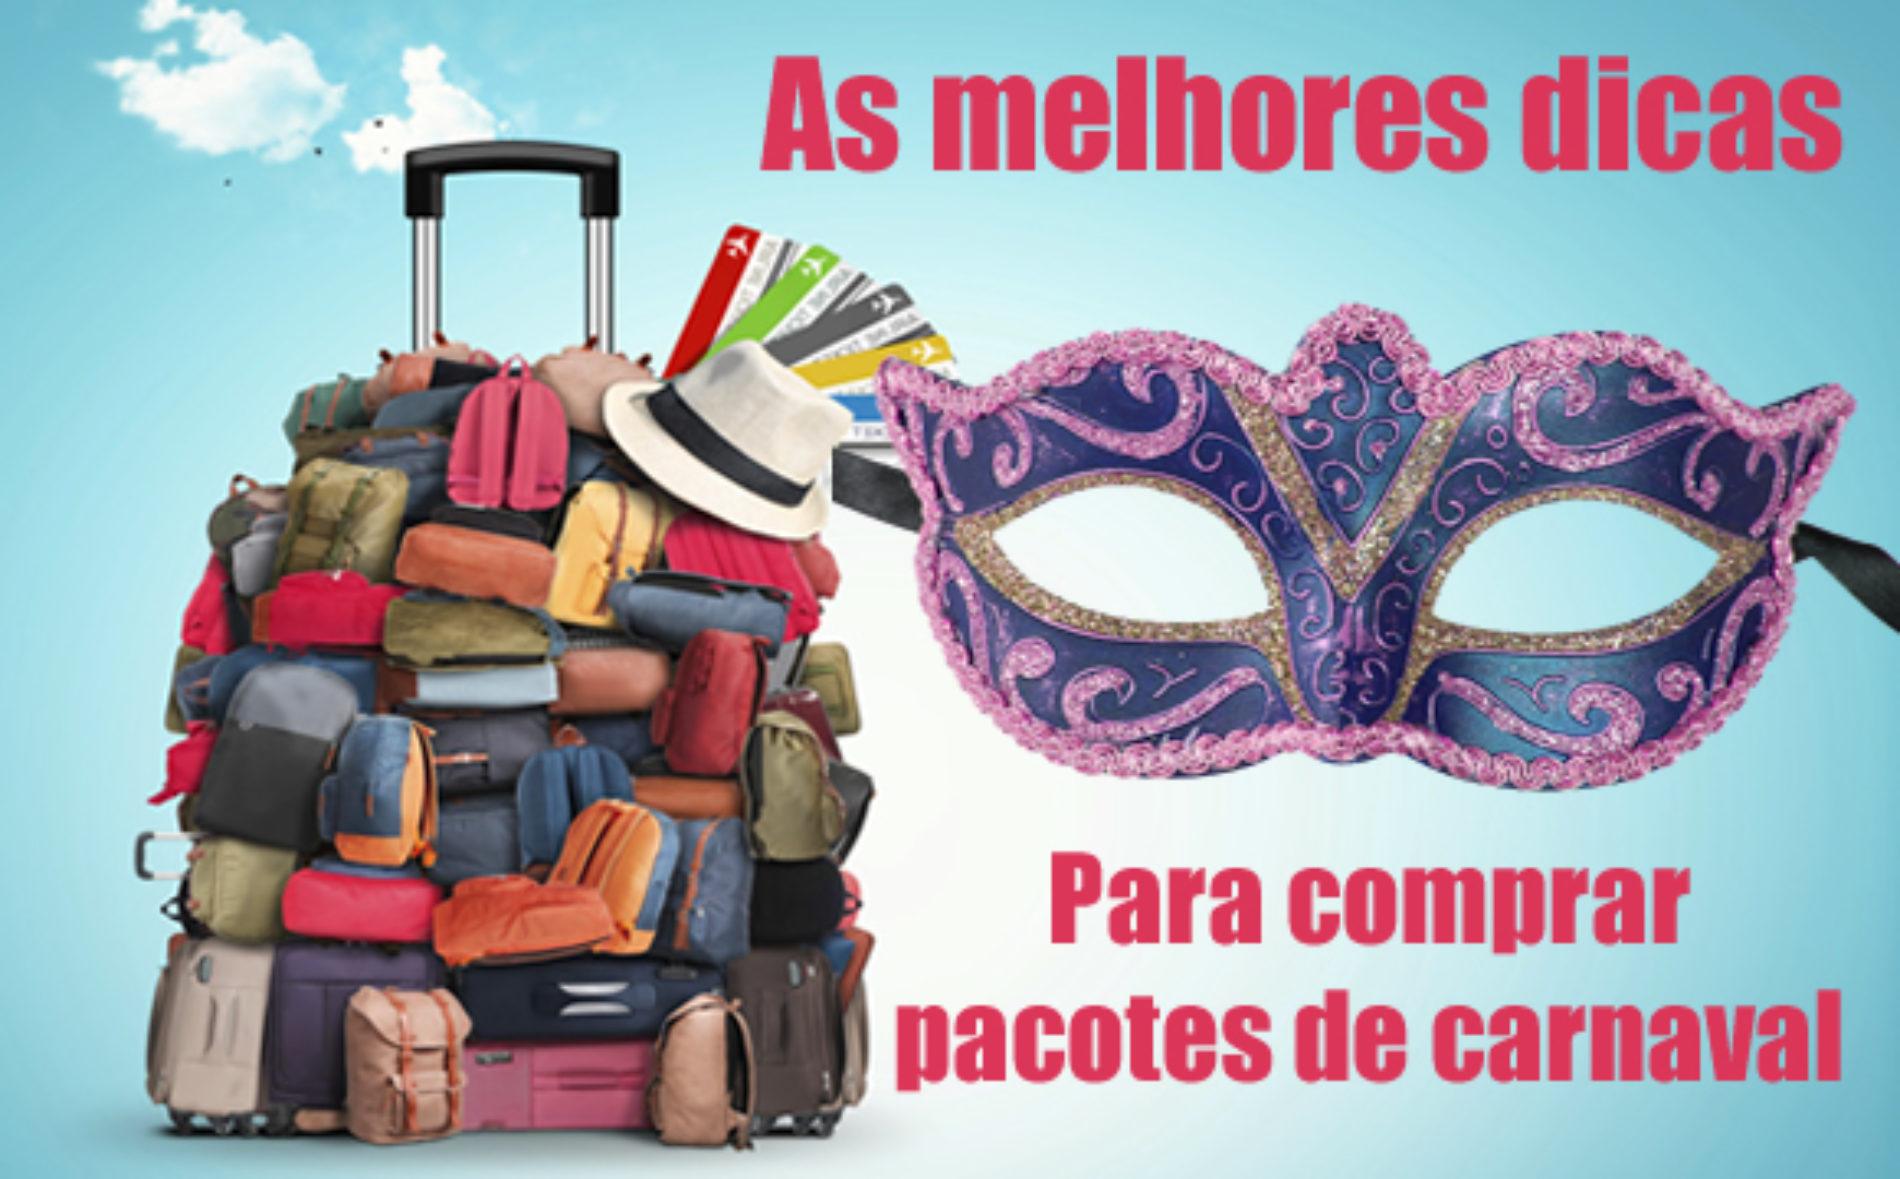 Como comprar pacotes de Carnaval 2020 baratos